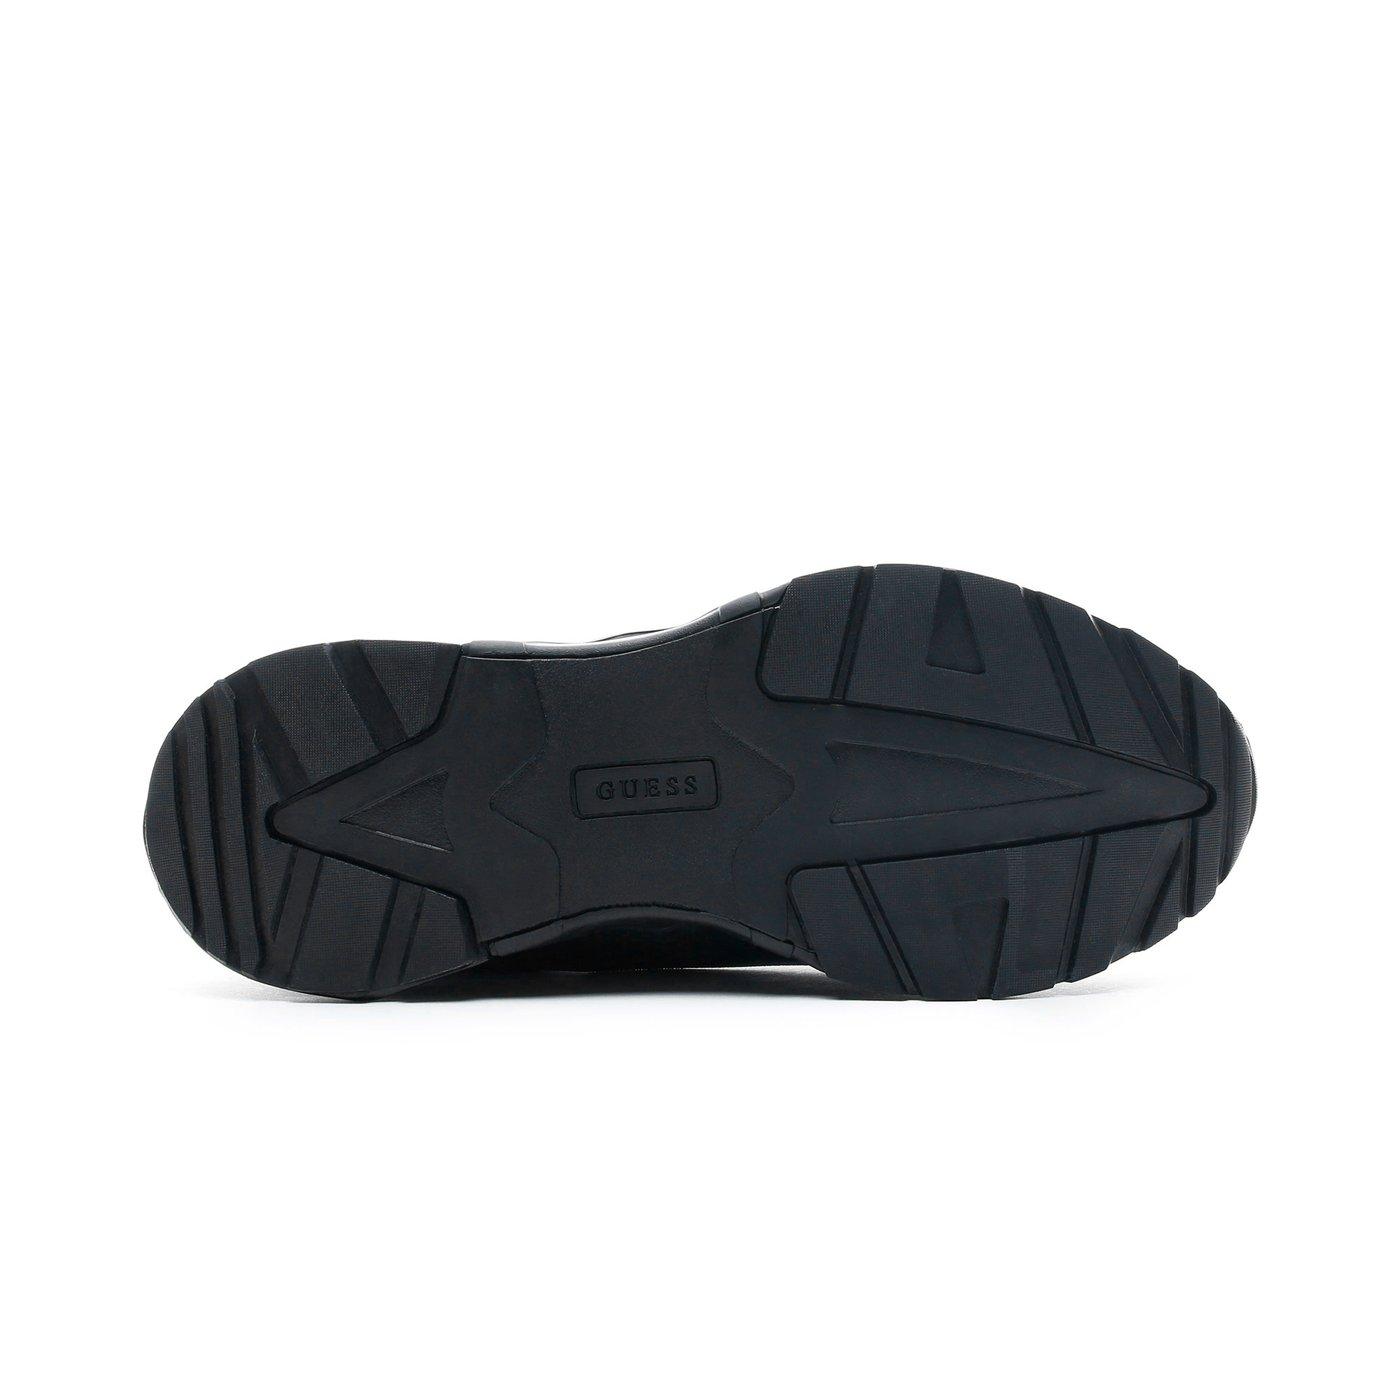 Guess Terain7 Kadın Siyah Spor Ayakkabı